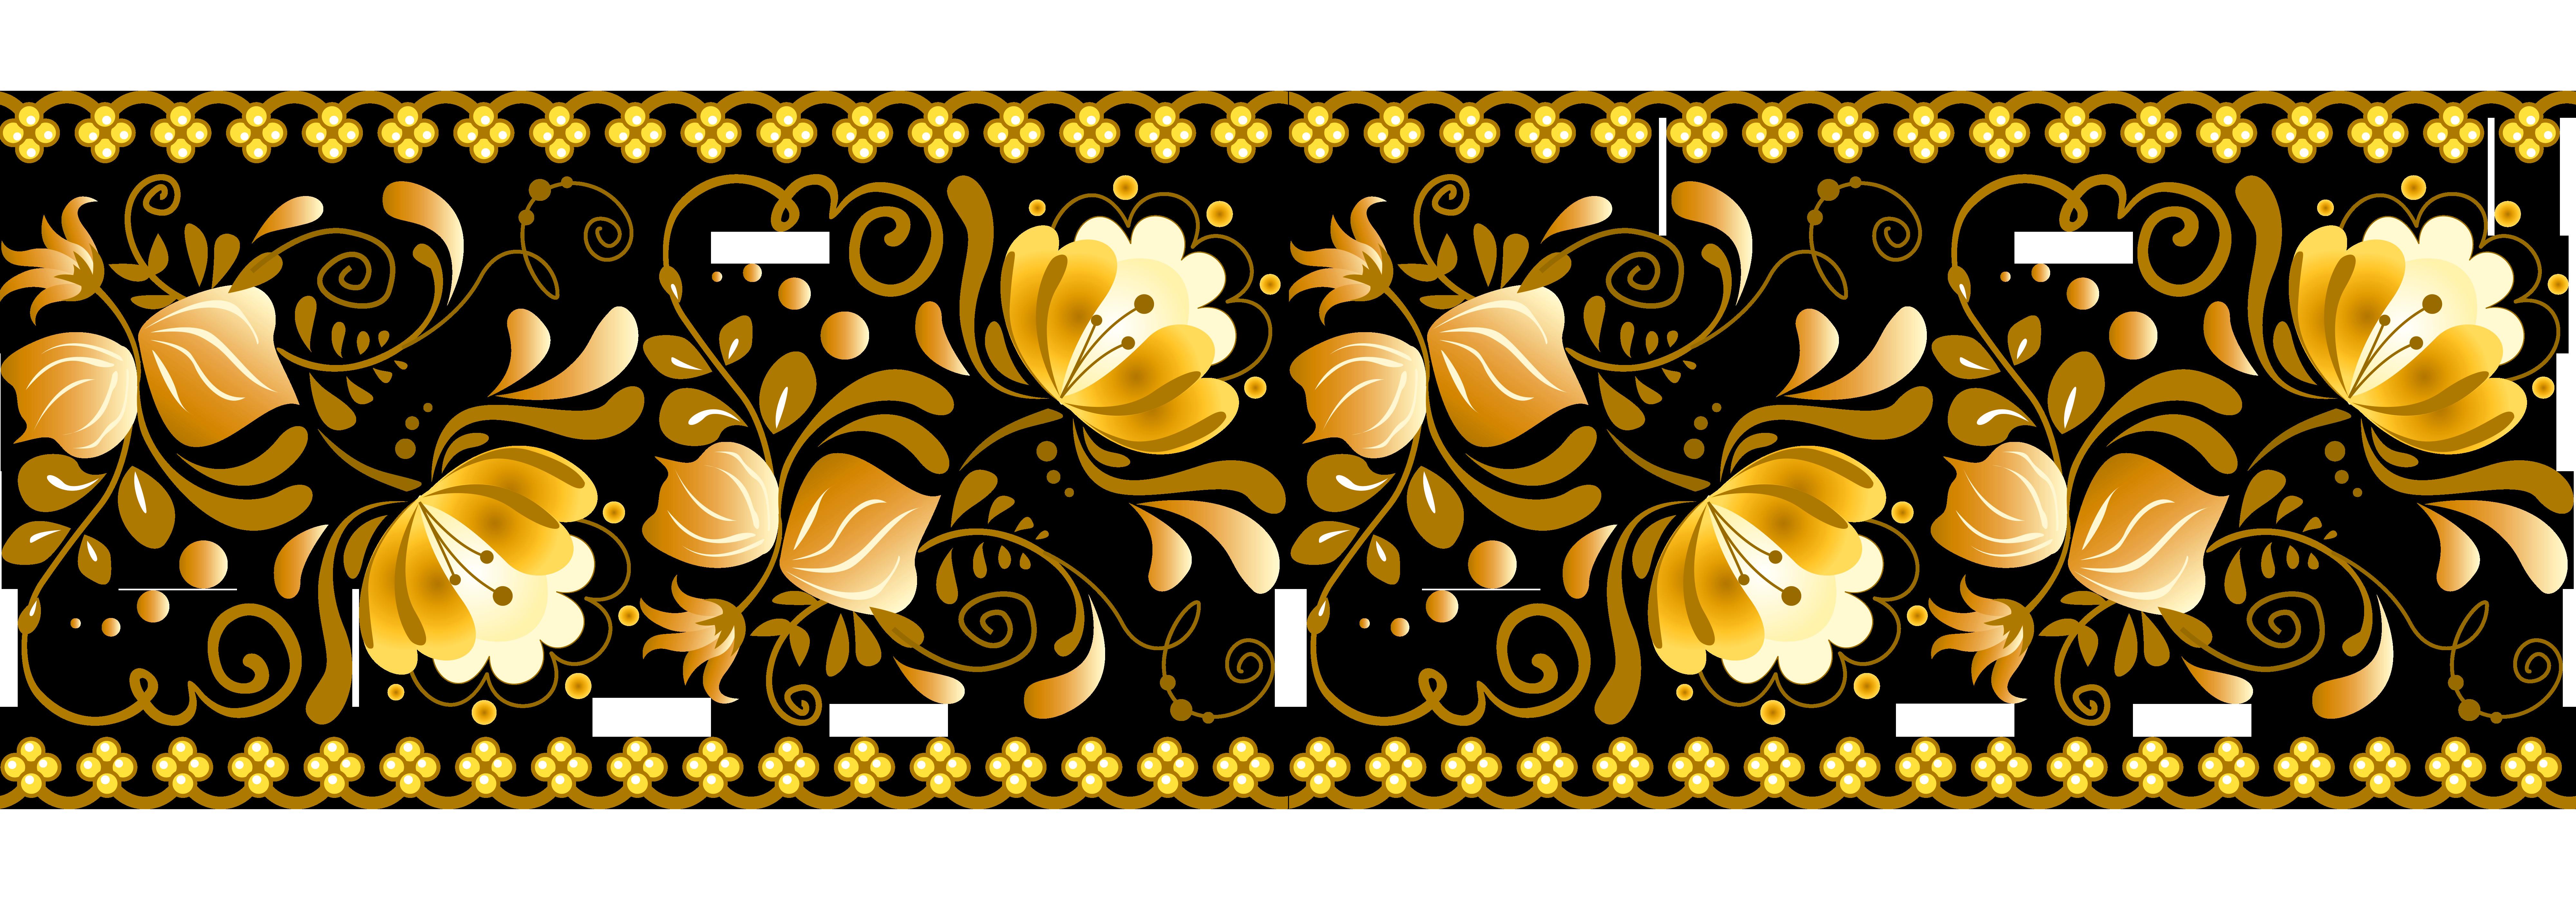 free photo decorative ornamentation stone texture free